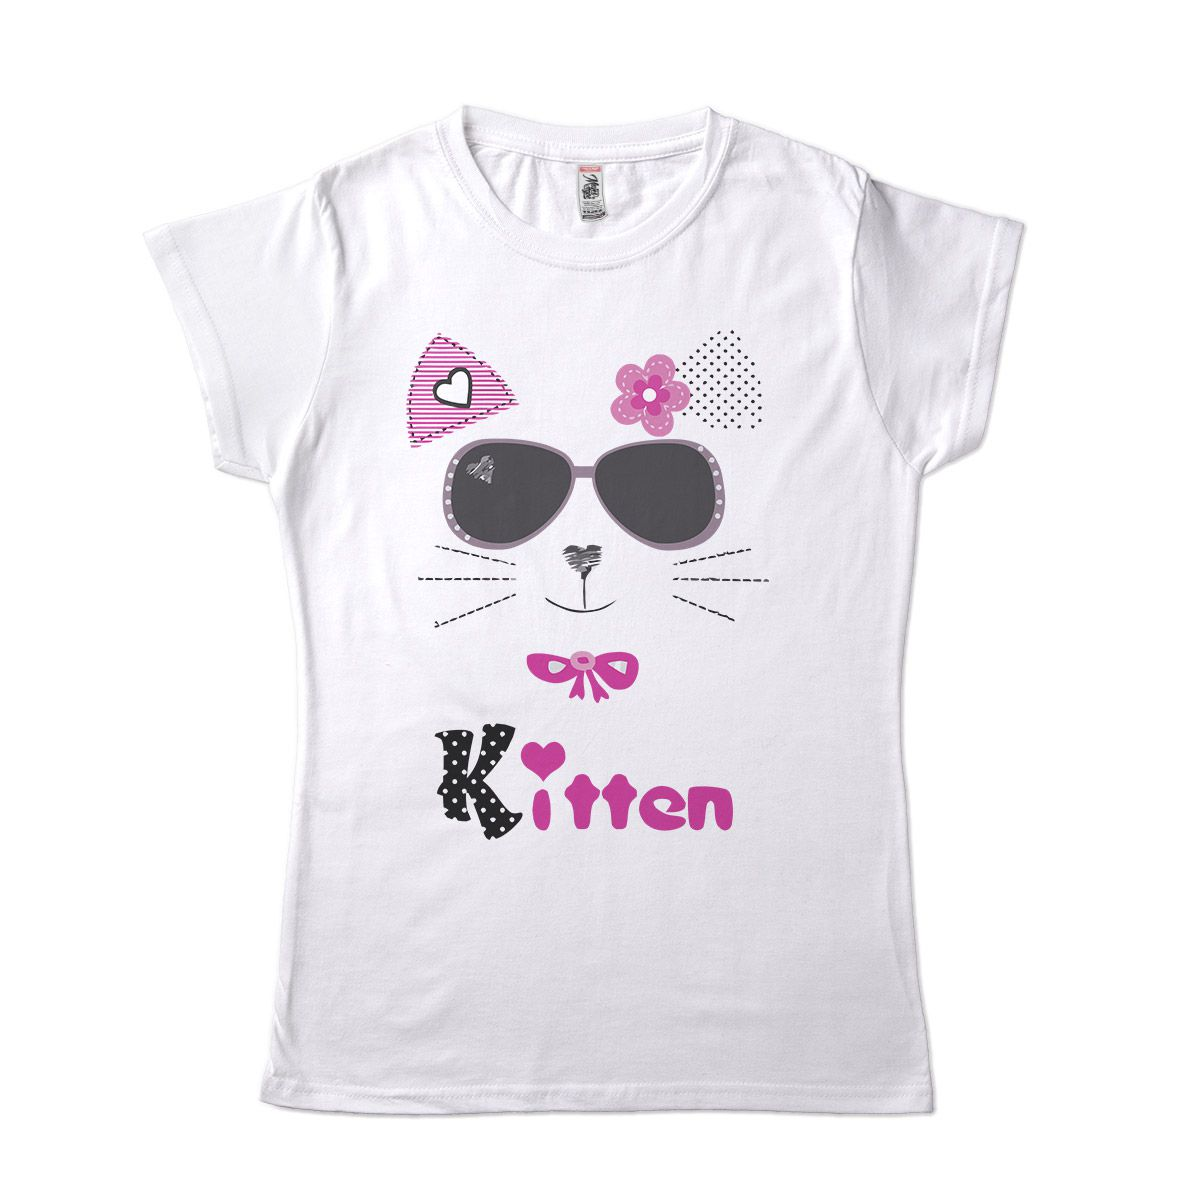 camiseta feminina estilosa com estampa de gatinha fofa